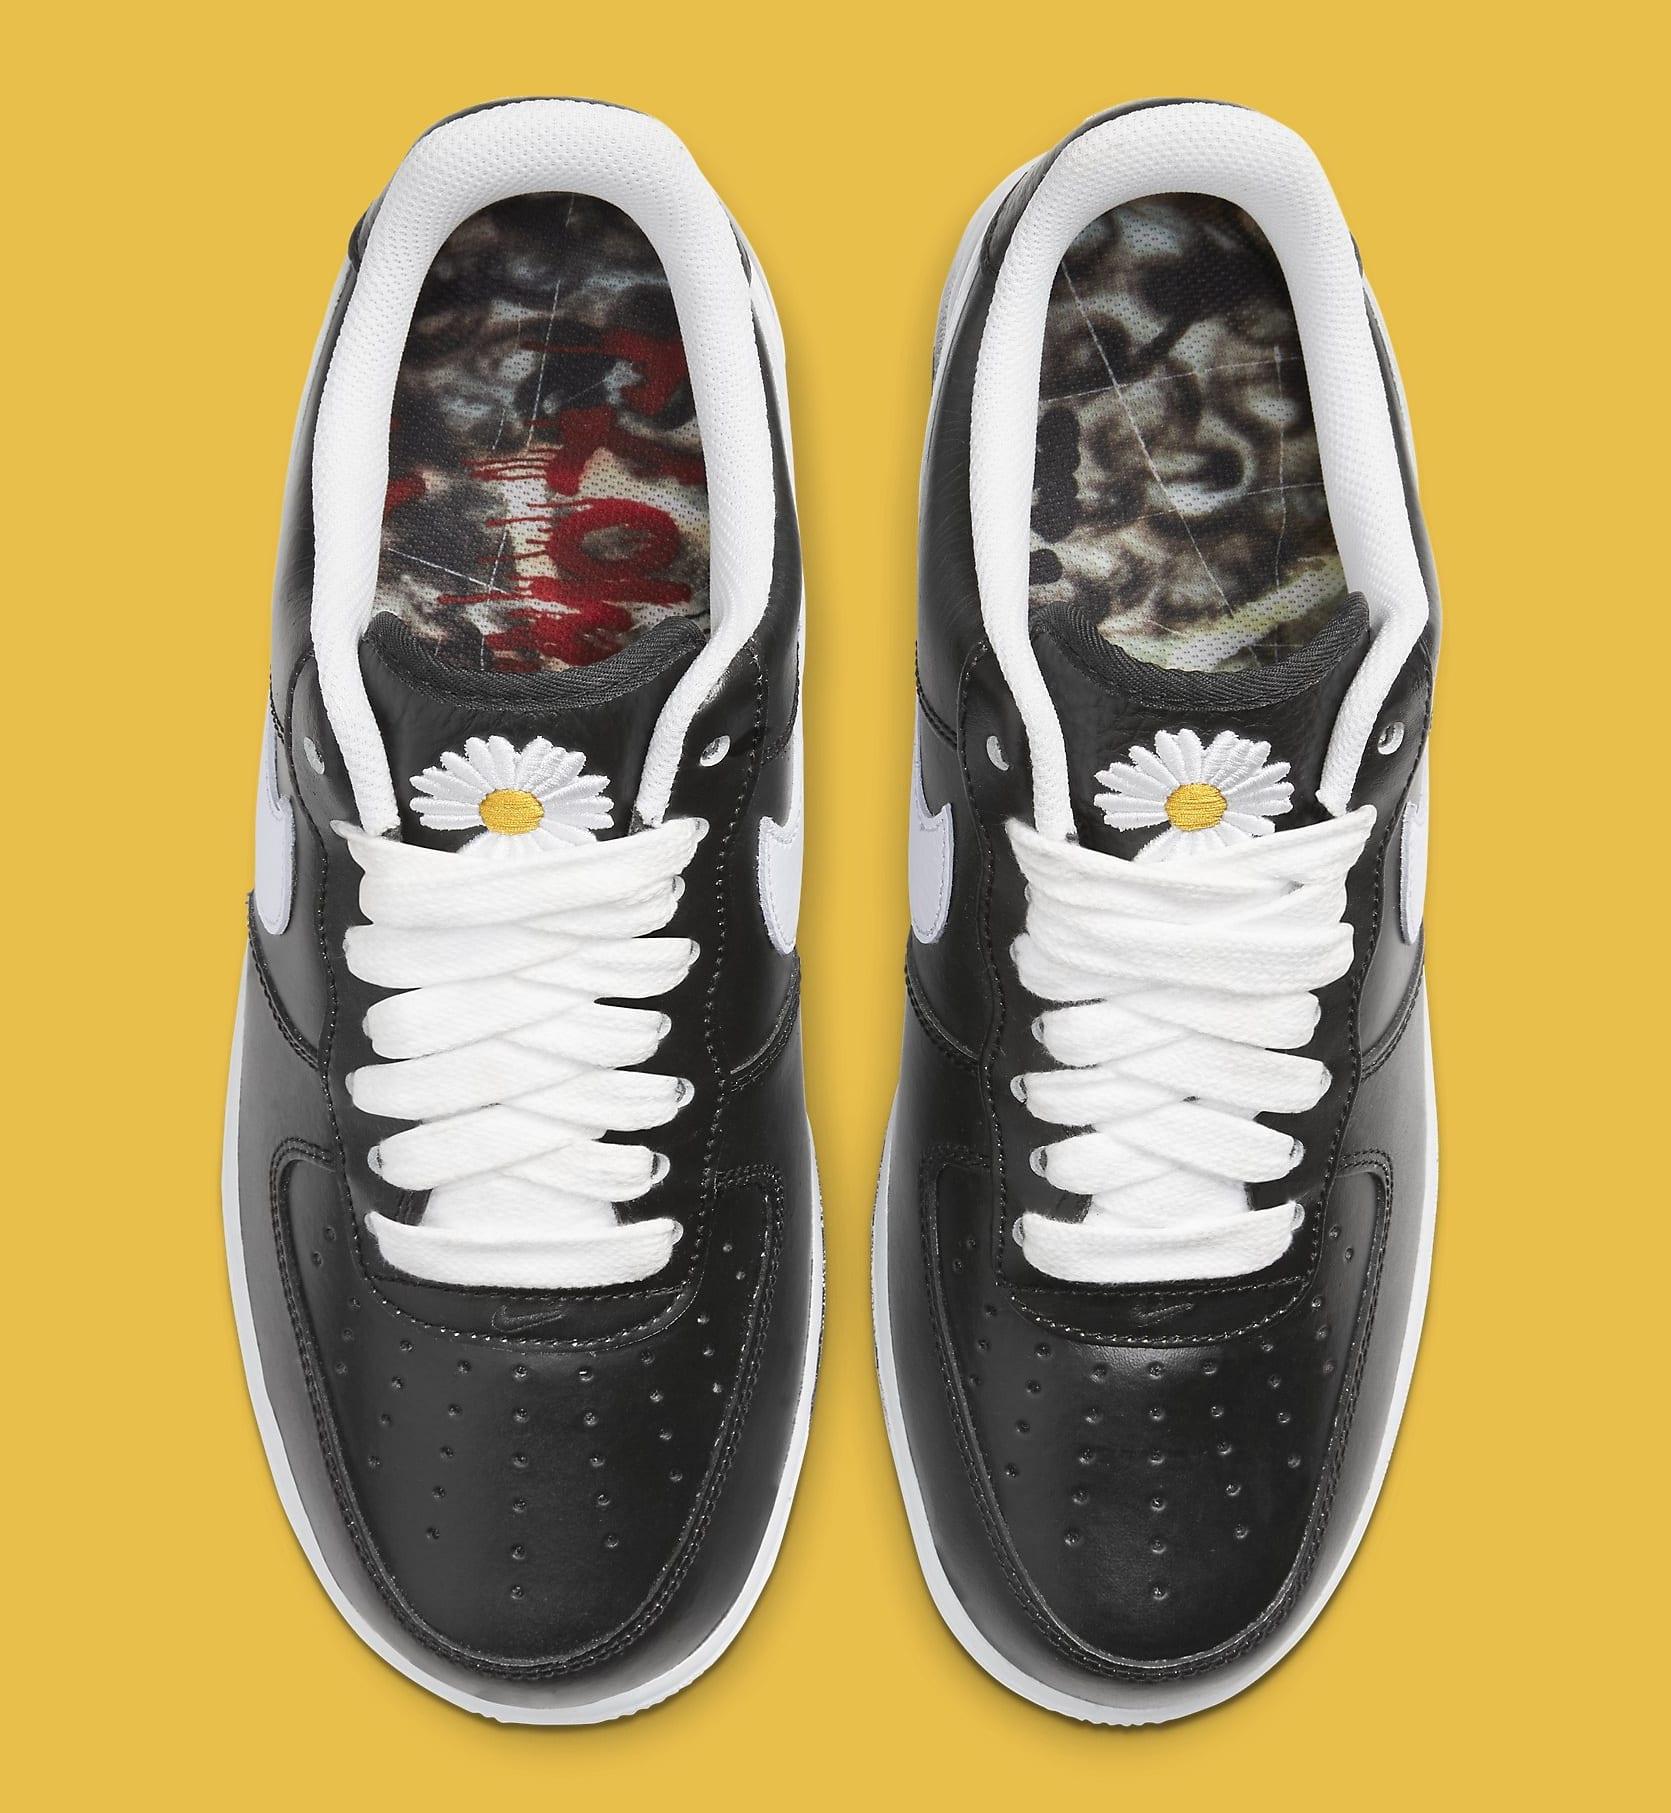 G Dragon Nike Air Force 1 Para Noise AQ3692 001 Release Date